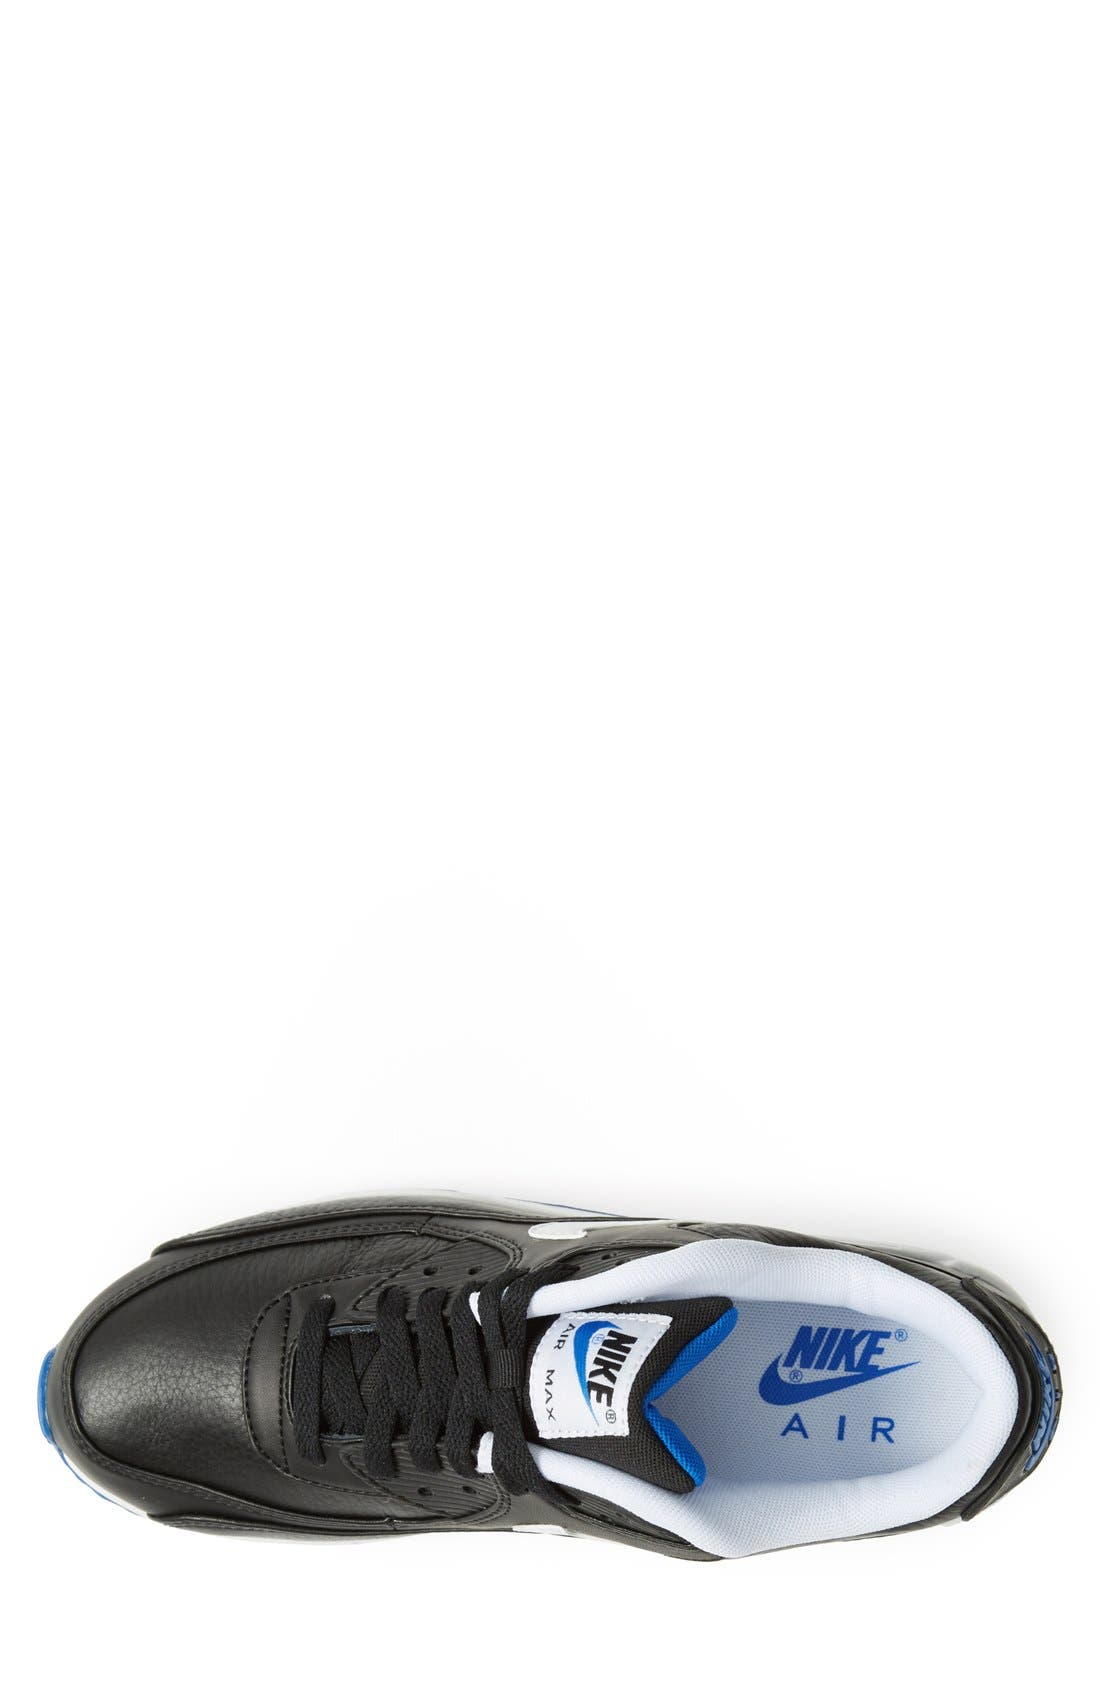 NIKE,                             'Air Max 90 LTR' Sneaker,                             Alternate thumbnail 4, color,                             001